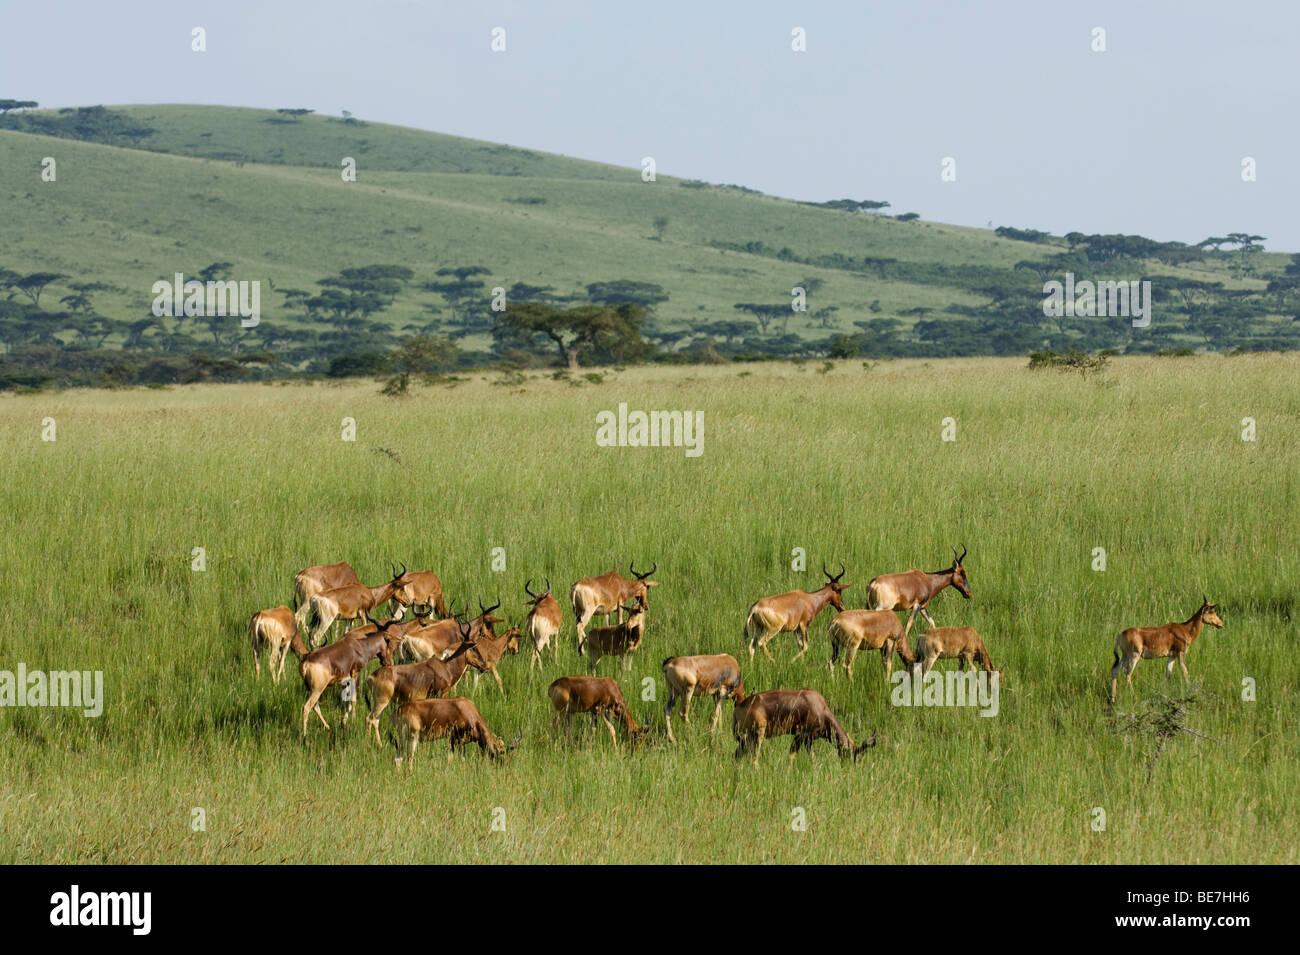 Swayne's hartebeest (Alcelaphus buselaphus swaynei), Senkele Game sanctuary, Ethiopia Stock Photo